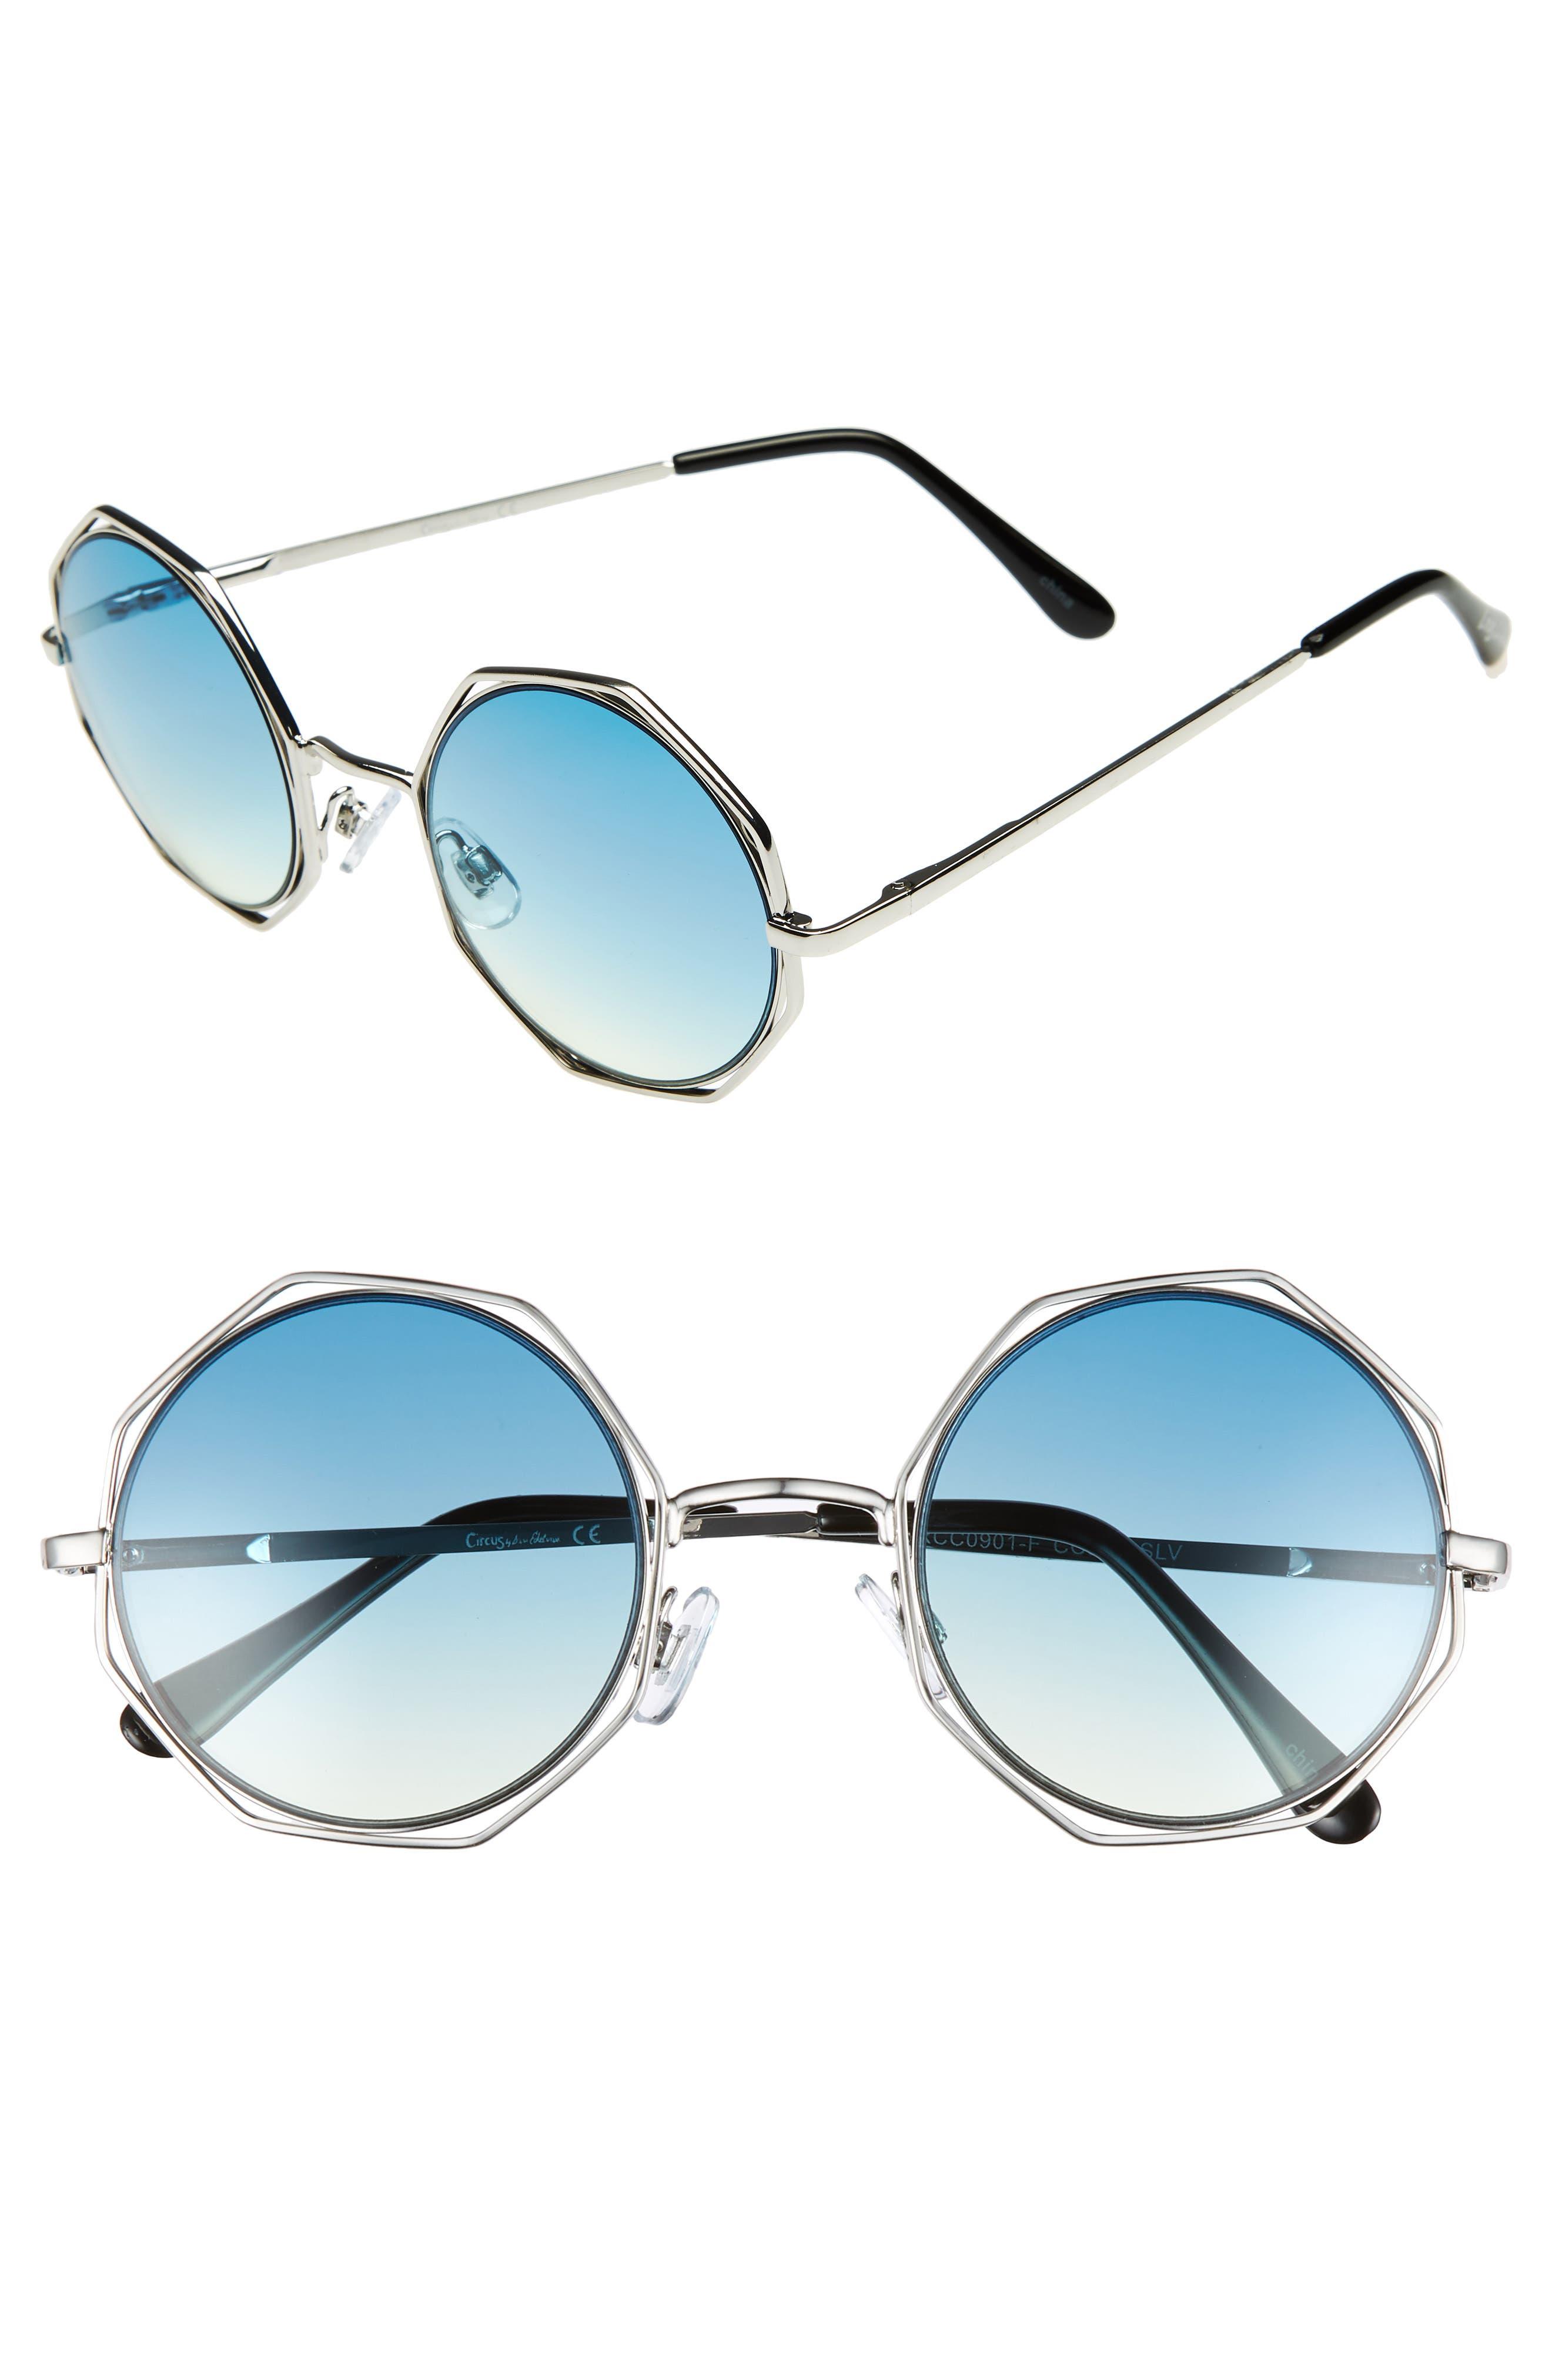 50mm Round Sunglasses,                         Main,                         color, 040